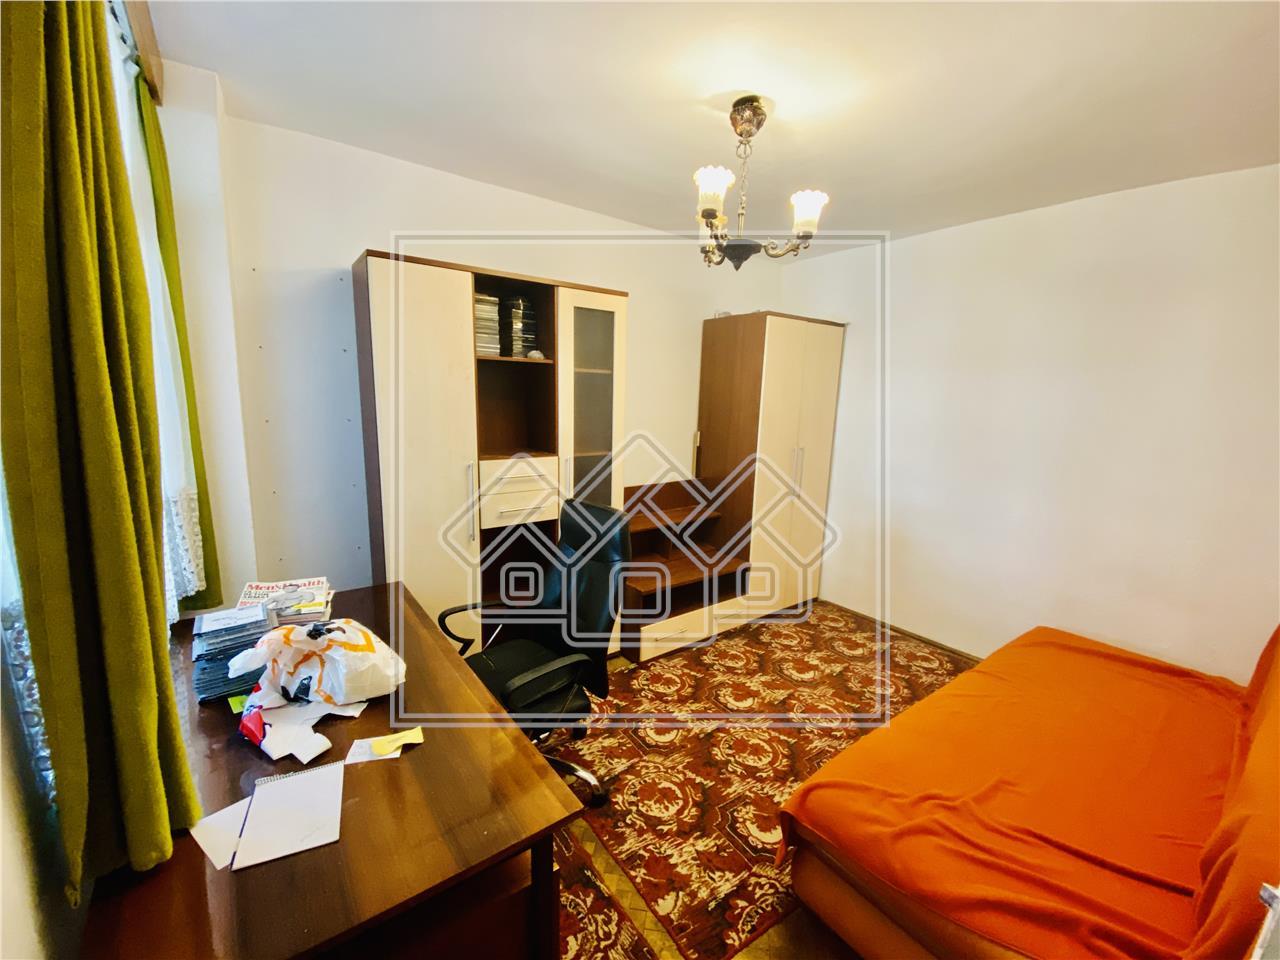 Apartament de vanzare in Sibiu -3 camere cu 2 balcoane- Zona Centrala